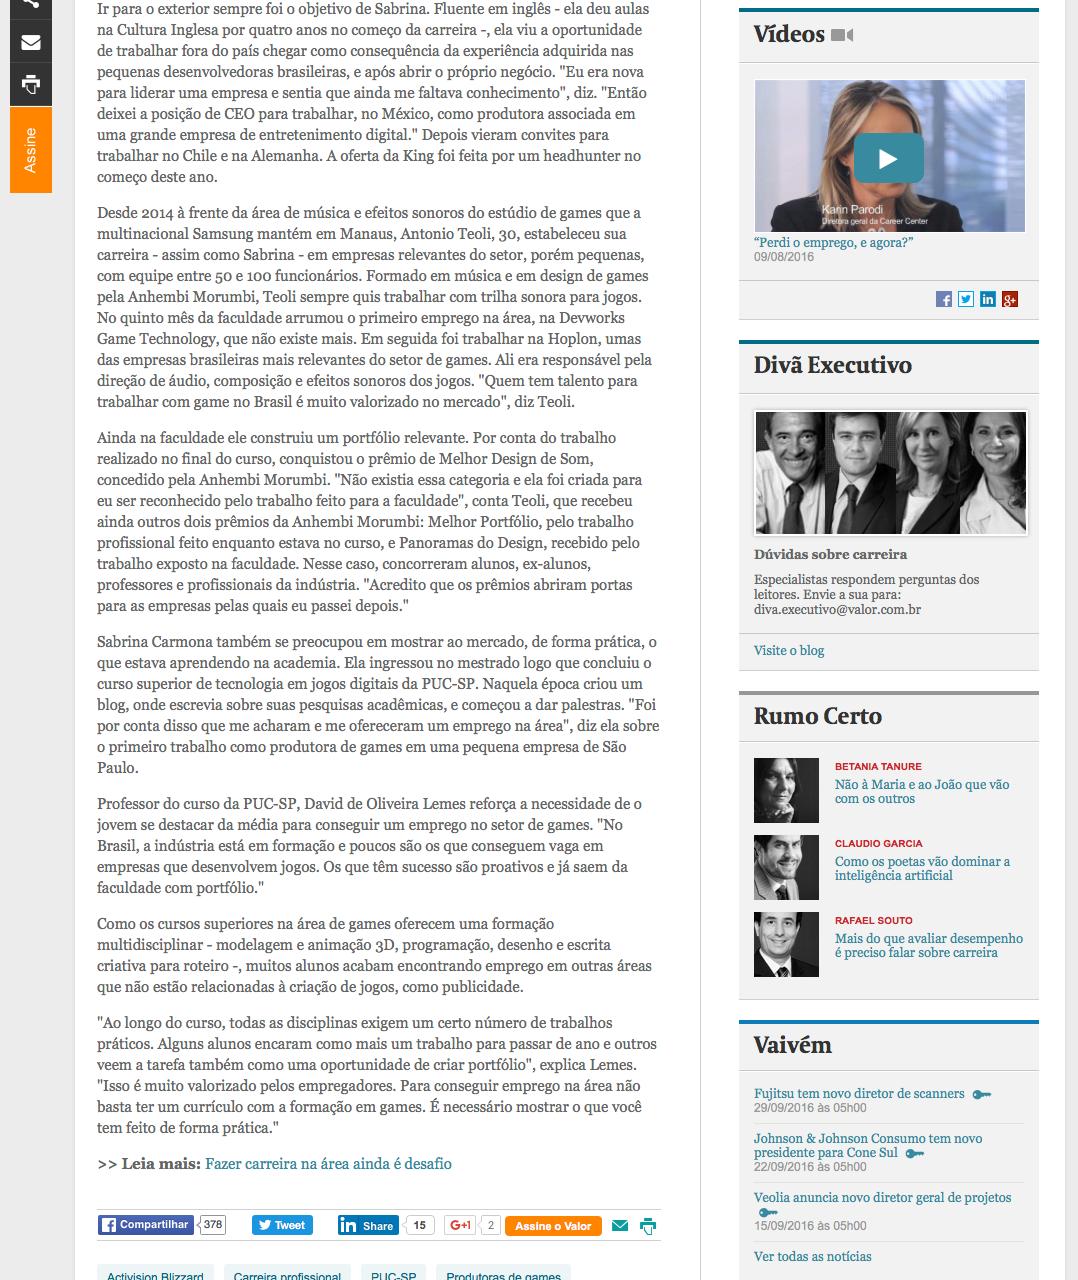 2016 - Valor Economico PG02